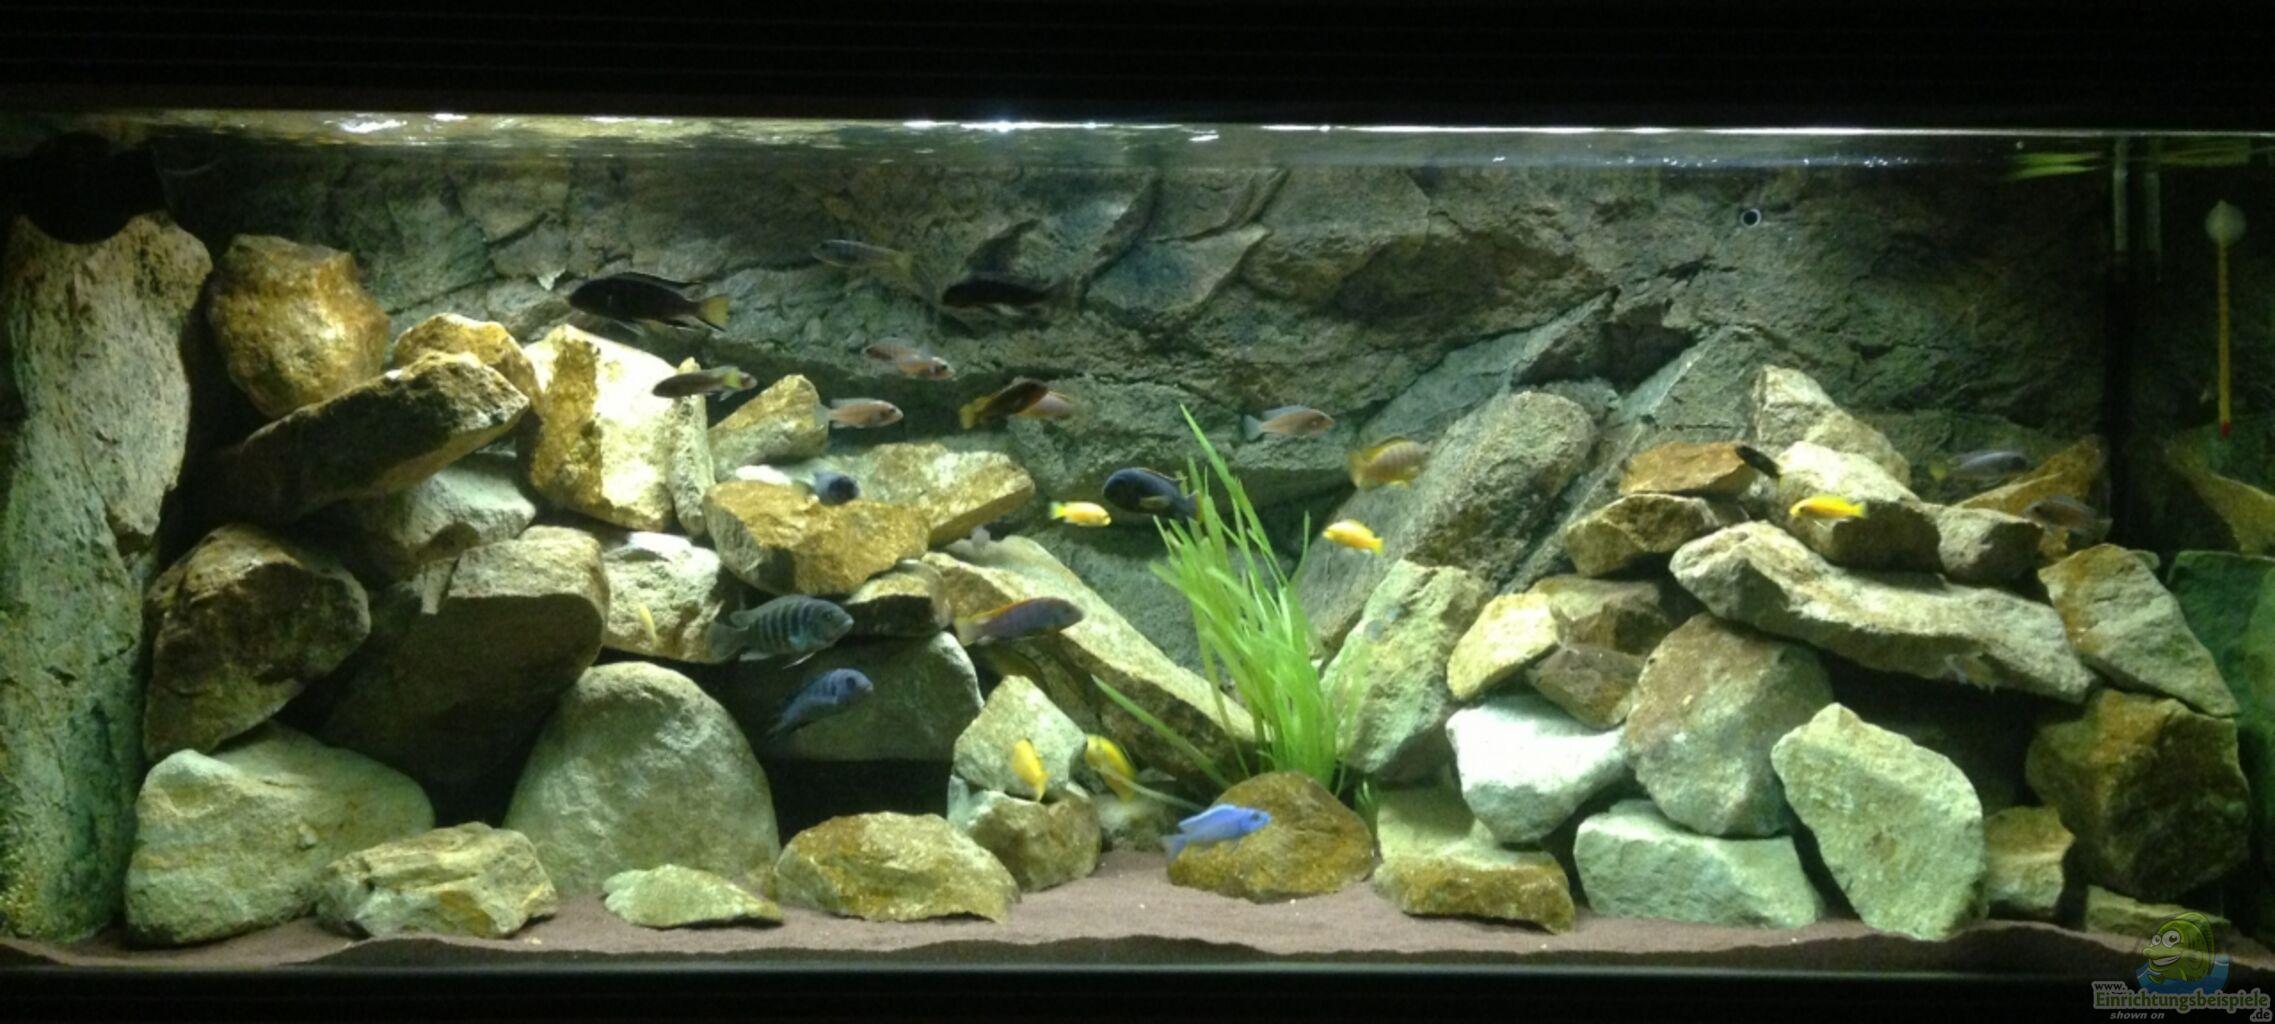 aquarium von green zebra mbuna rocks. Black Bedroom Furniture Sets. Home Design Ideas